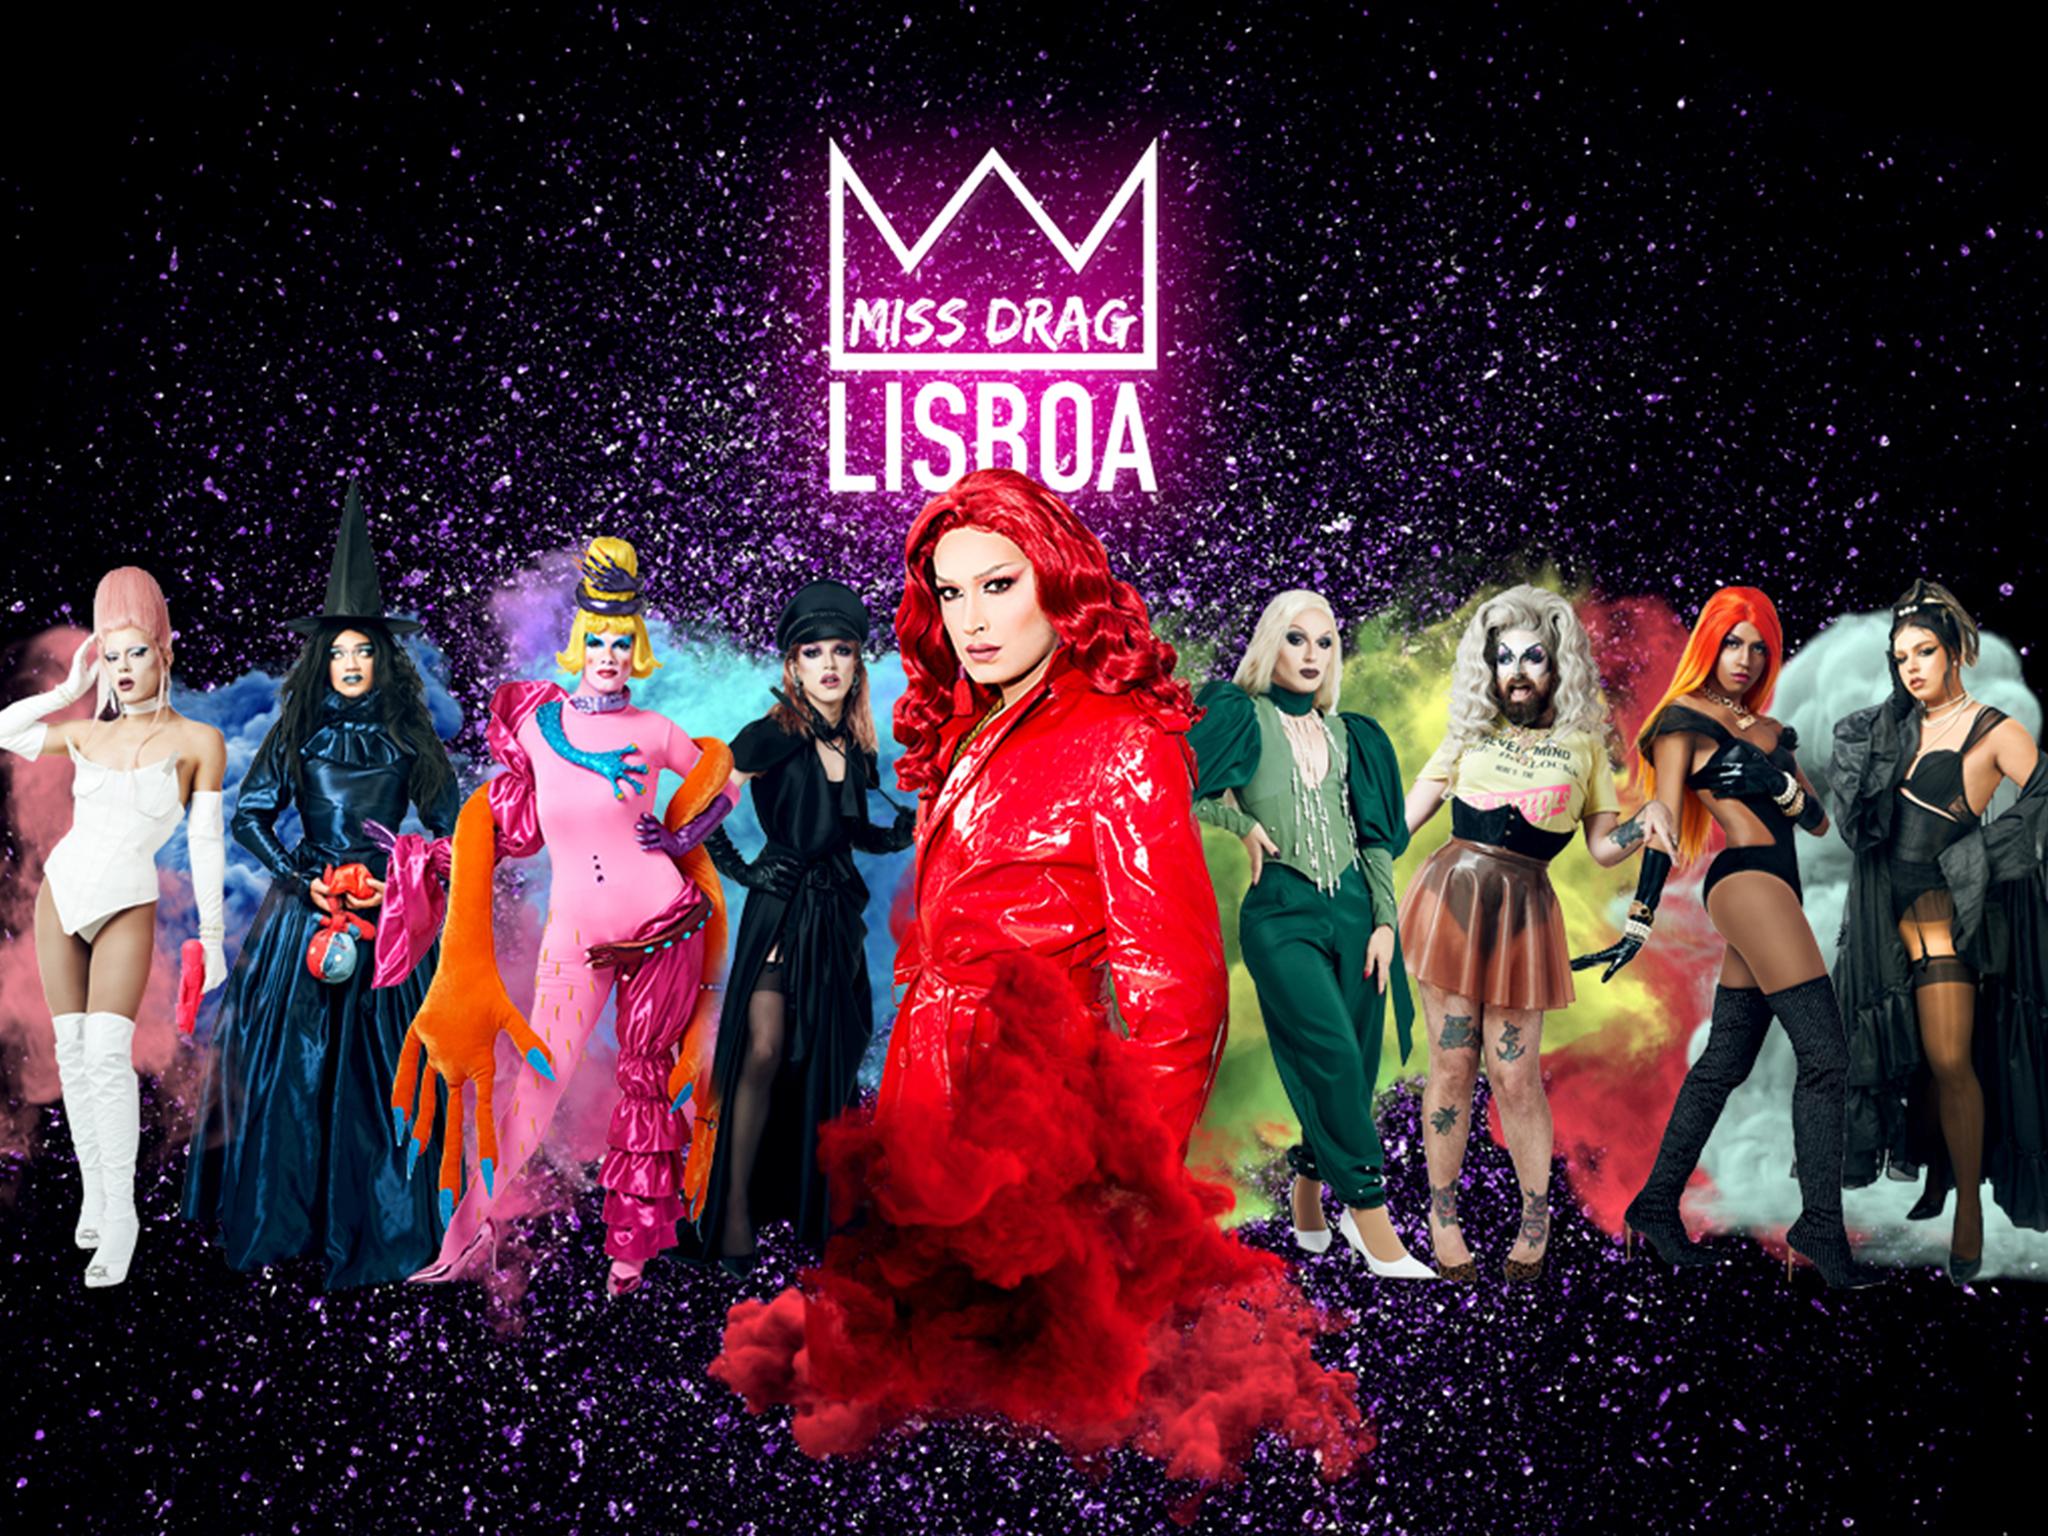 Miss Drag Lisboa: conheça a realeza alfacinha